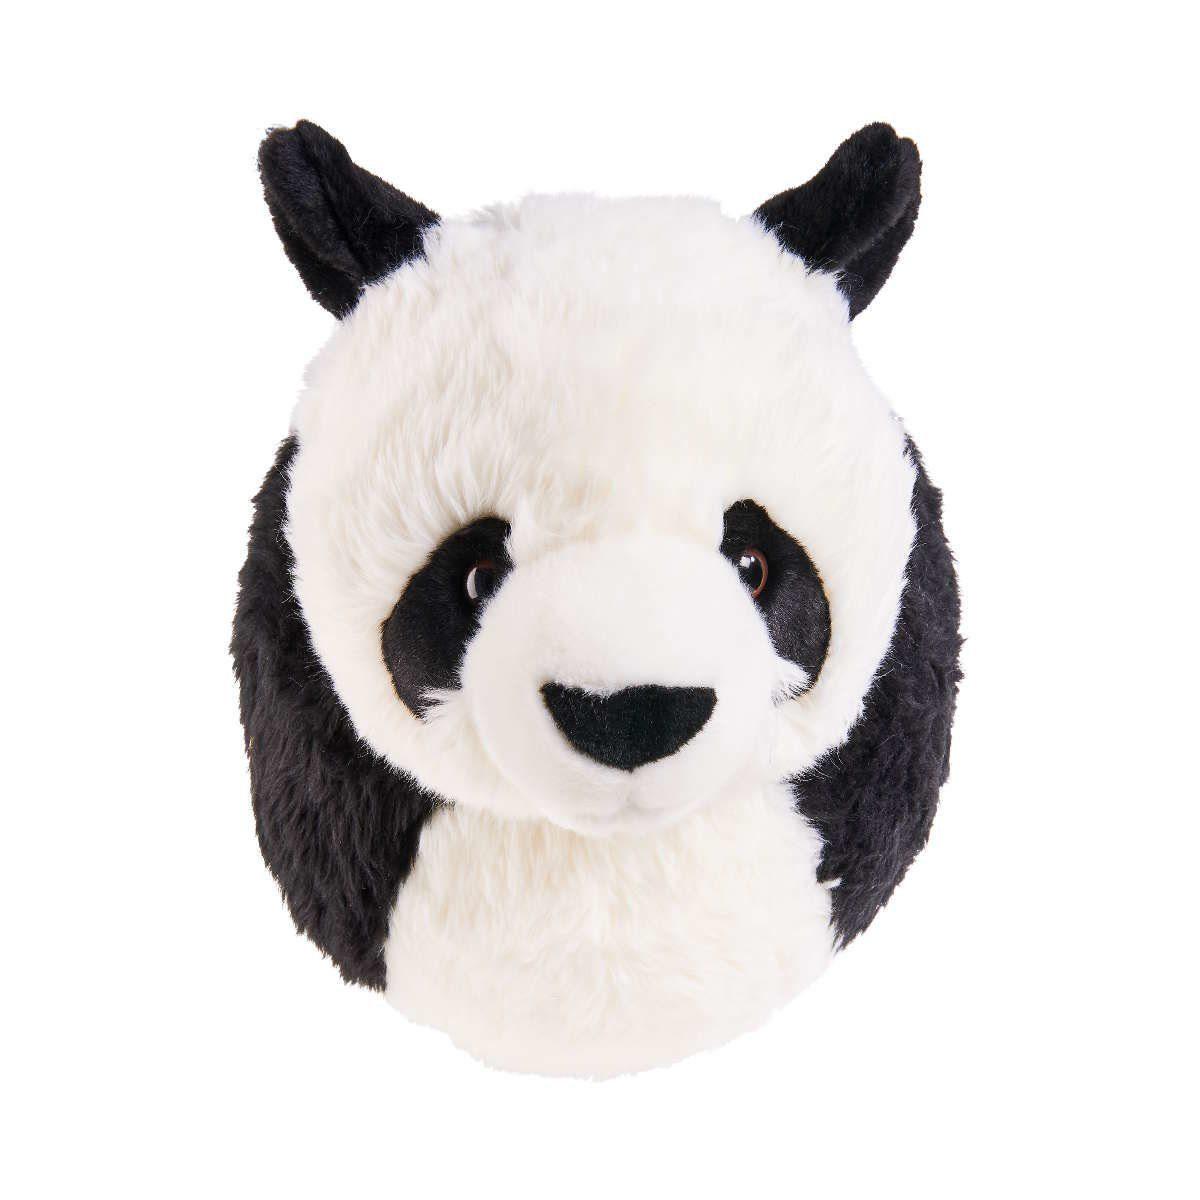 BUTLERS HALALI »Pandakopf groß«